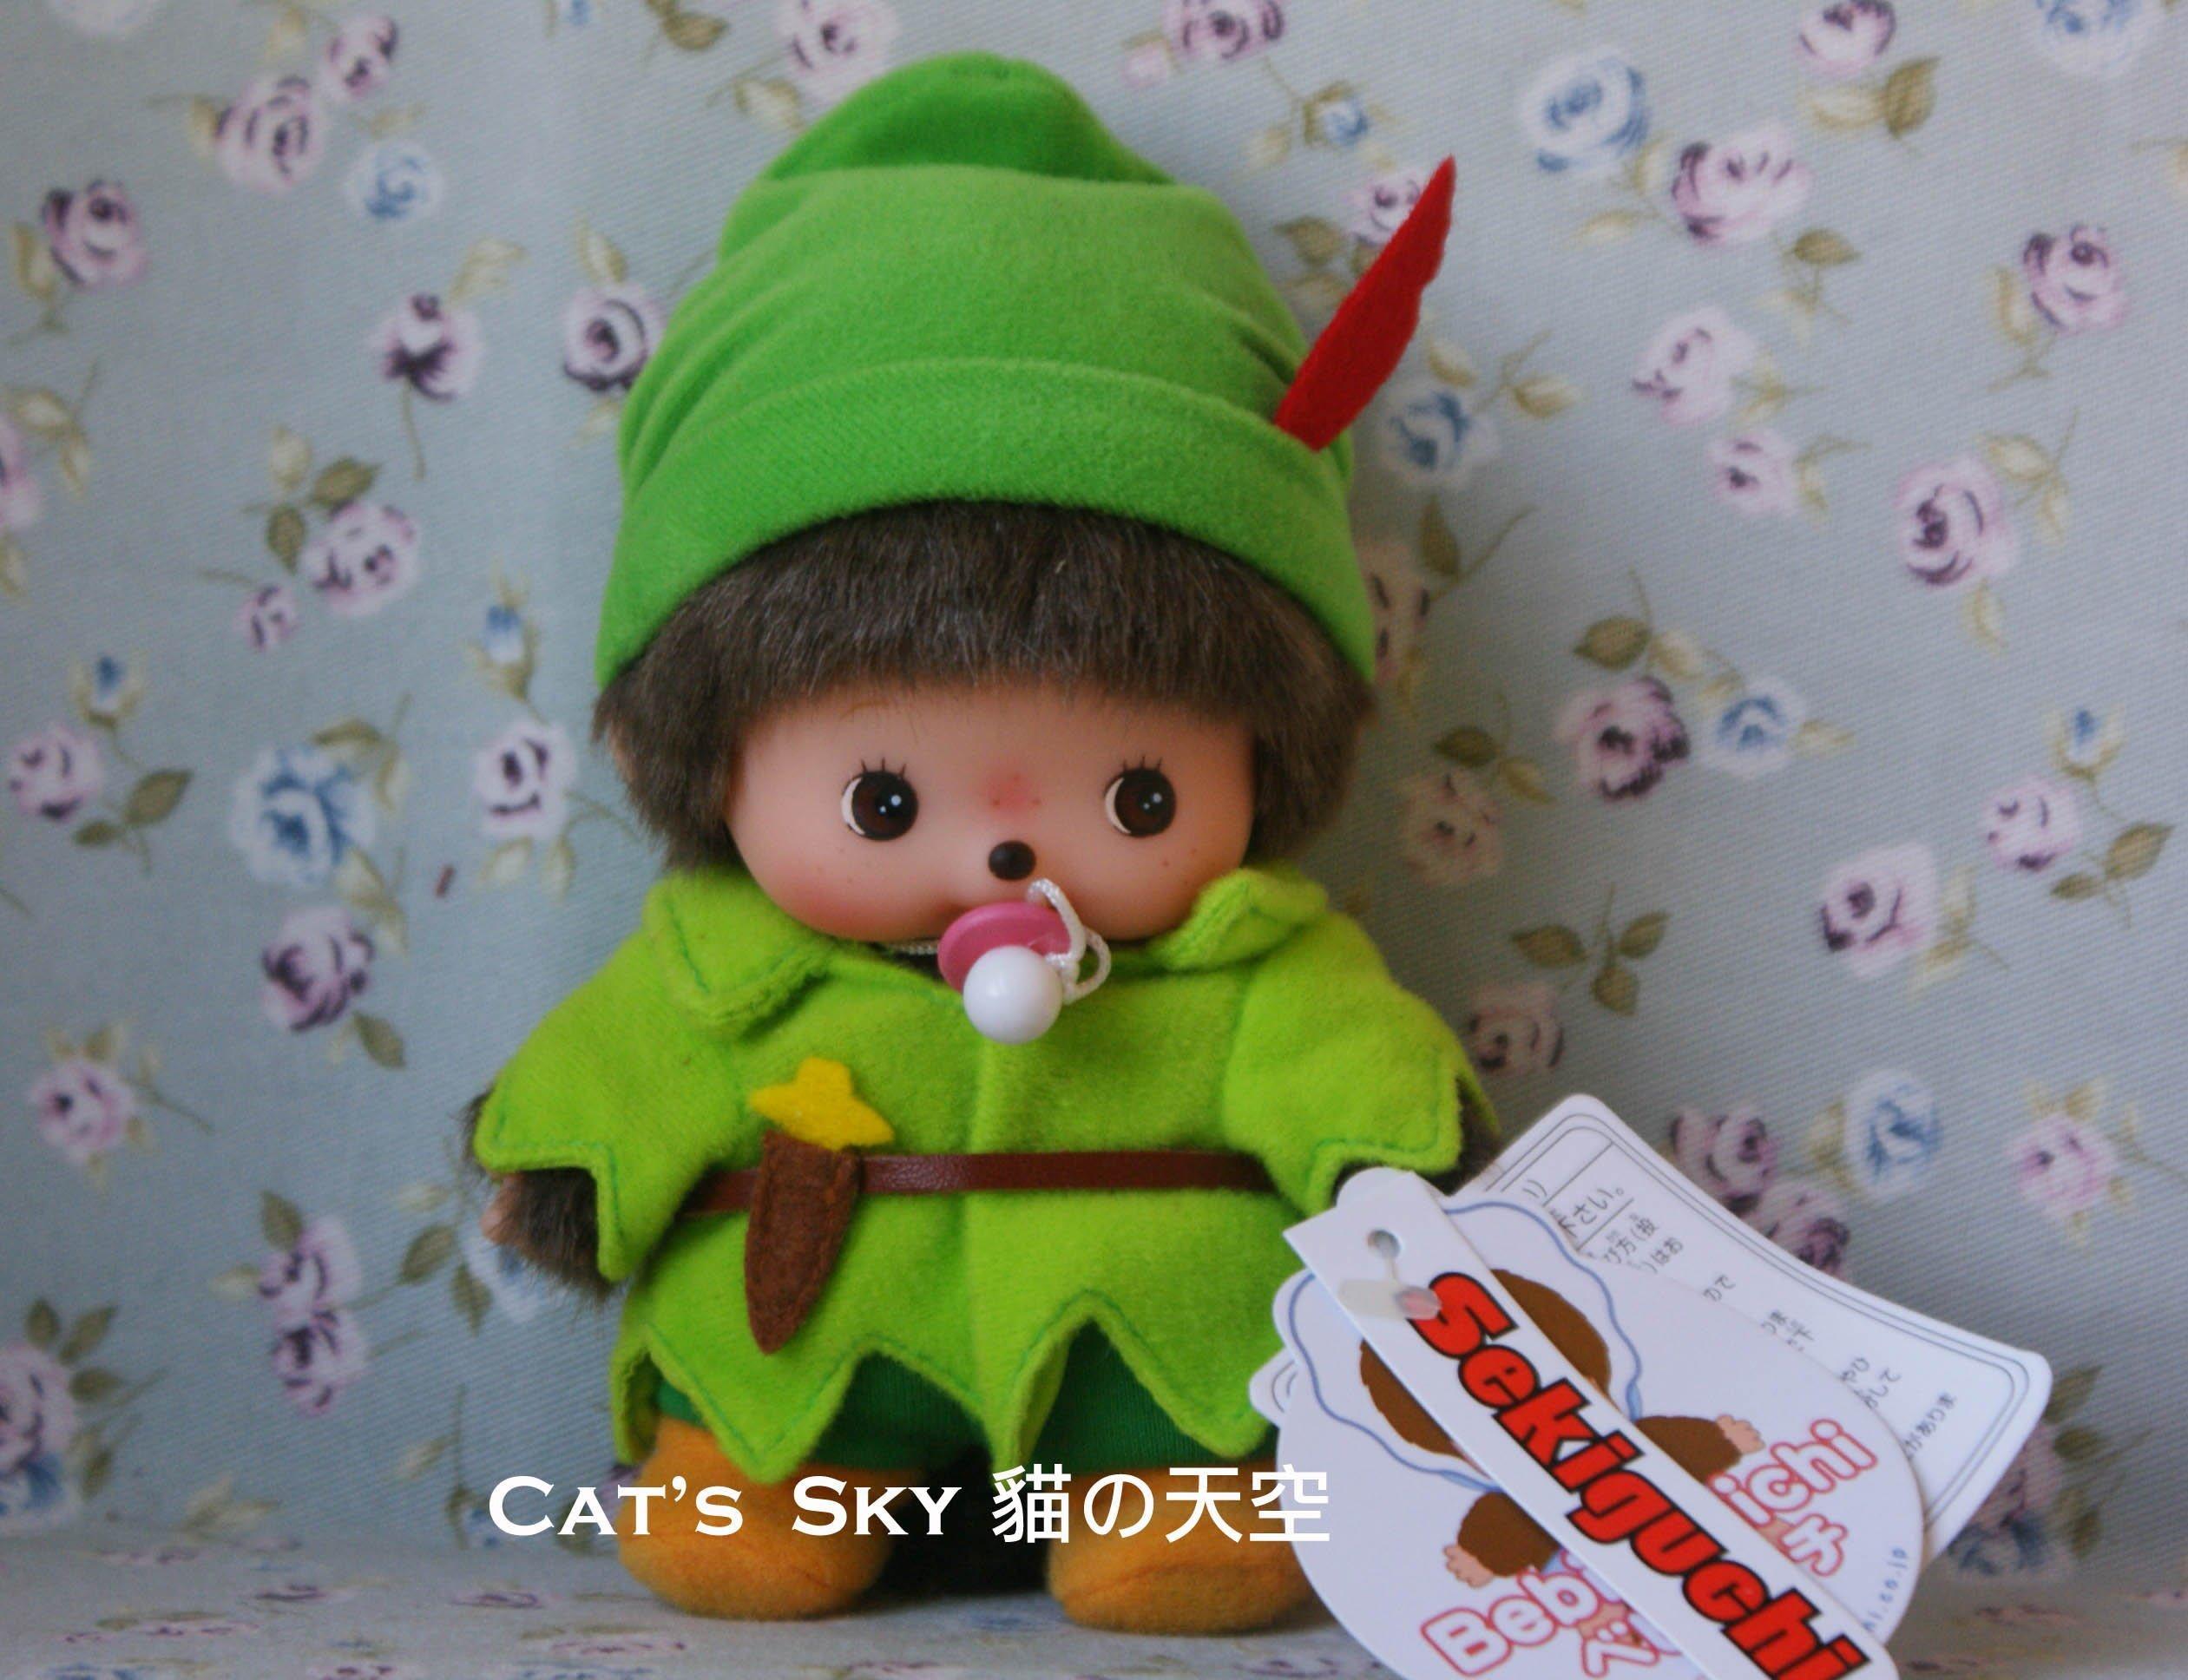 Cat Sky》日本Bebi Monchhichi童話故事主題.彼得潘嬰兒夢奇奇